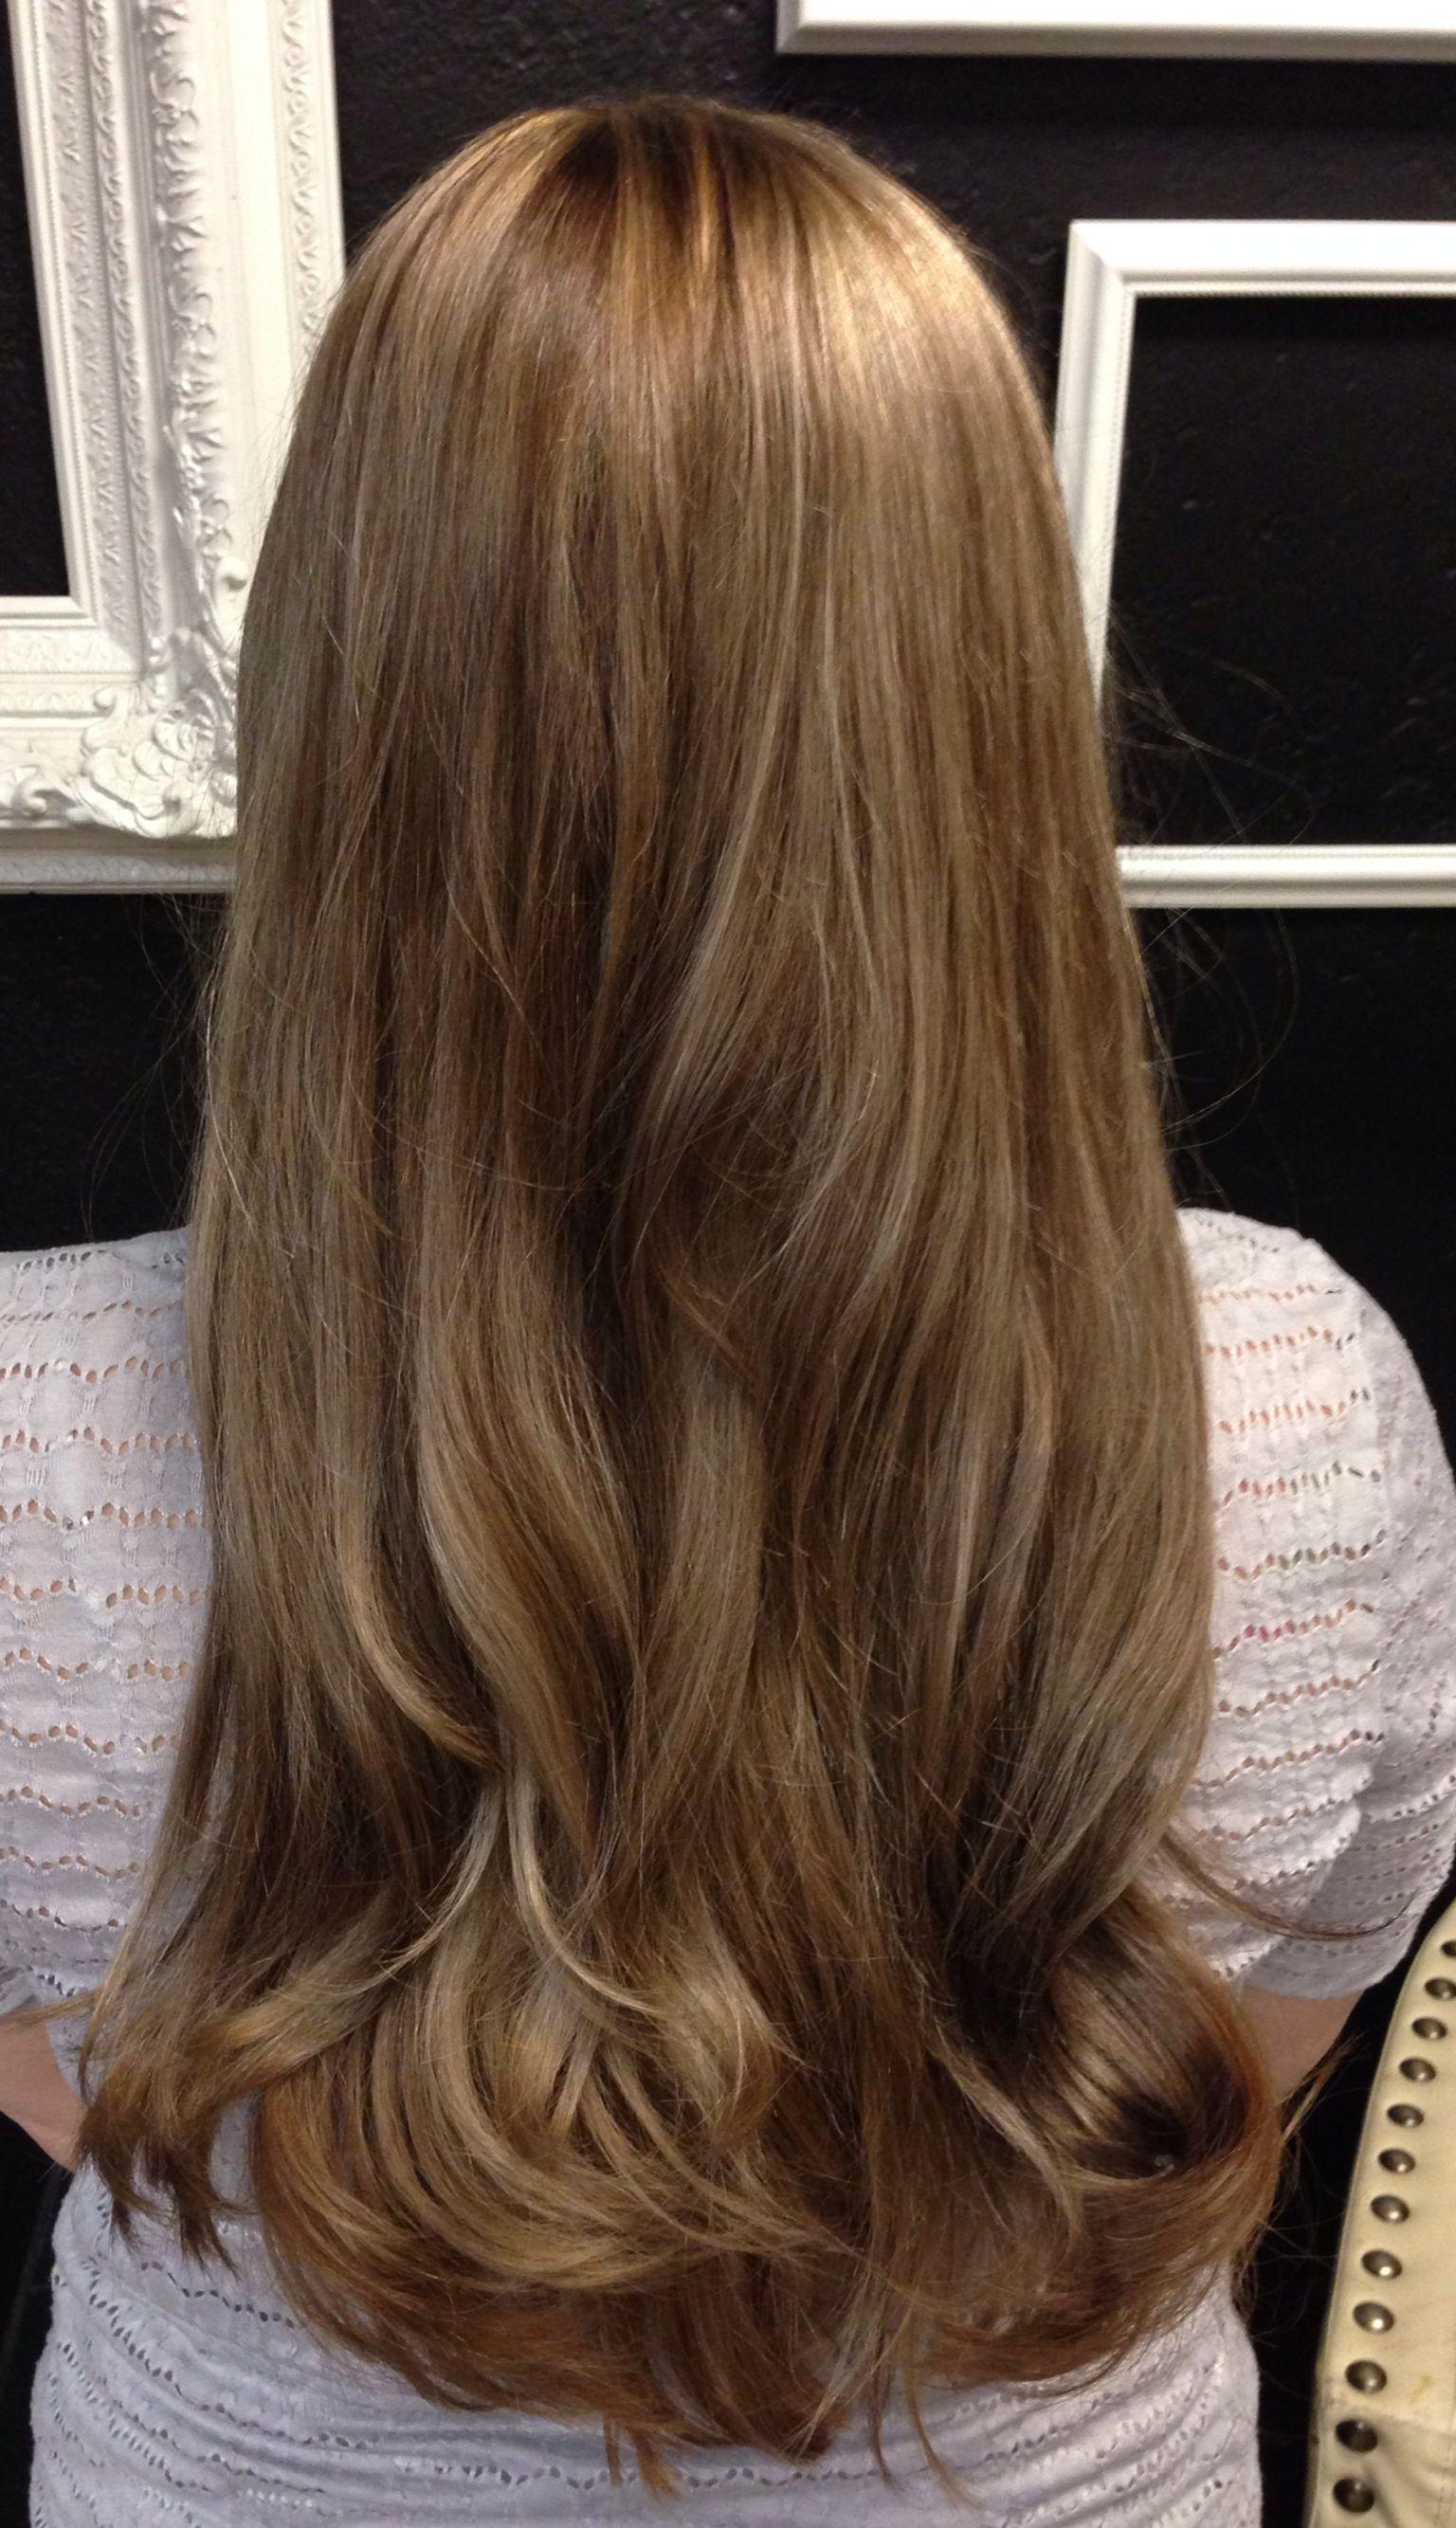 Medium brown with beigegolden tones subtle blonde highlights